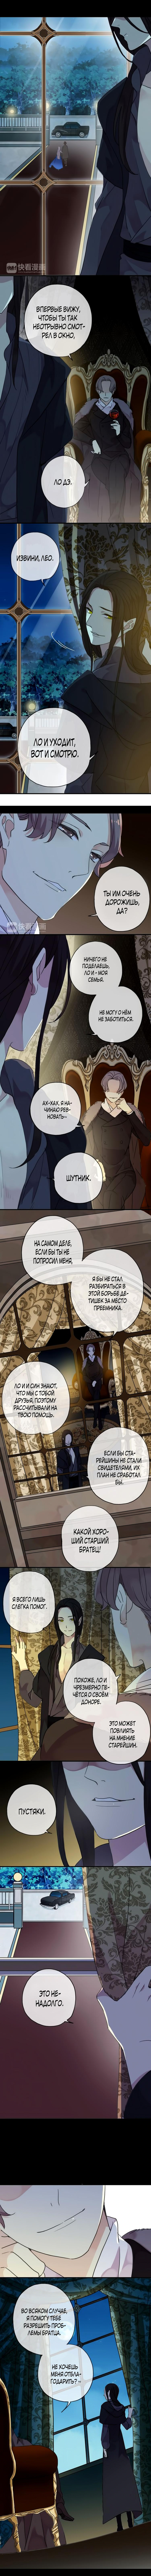 https://r1.ninemanga.com/comics/pic2/45/32237/410419/1520860117386.jpg Page 2